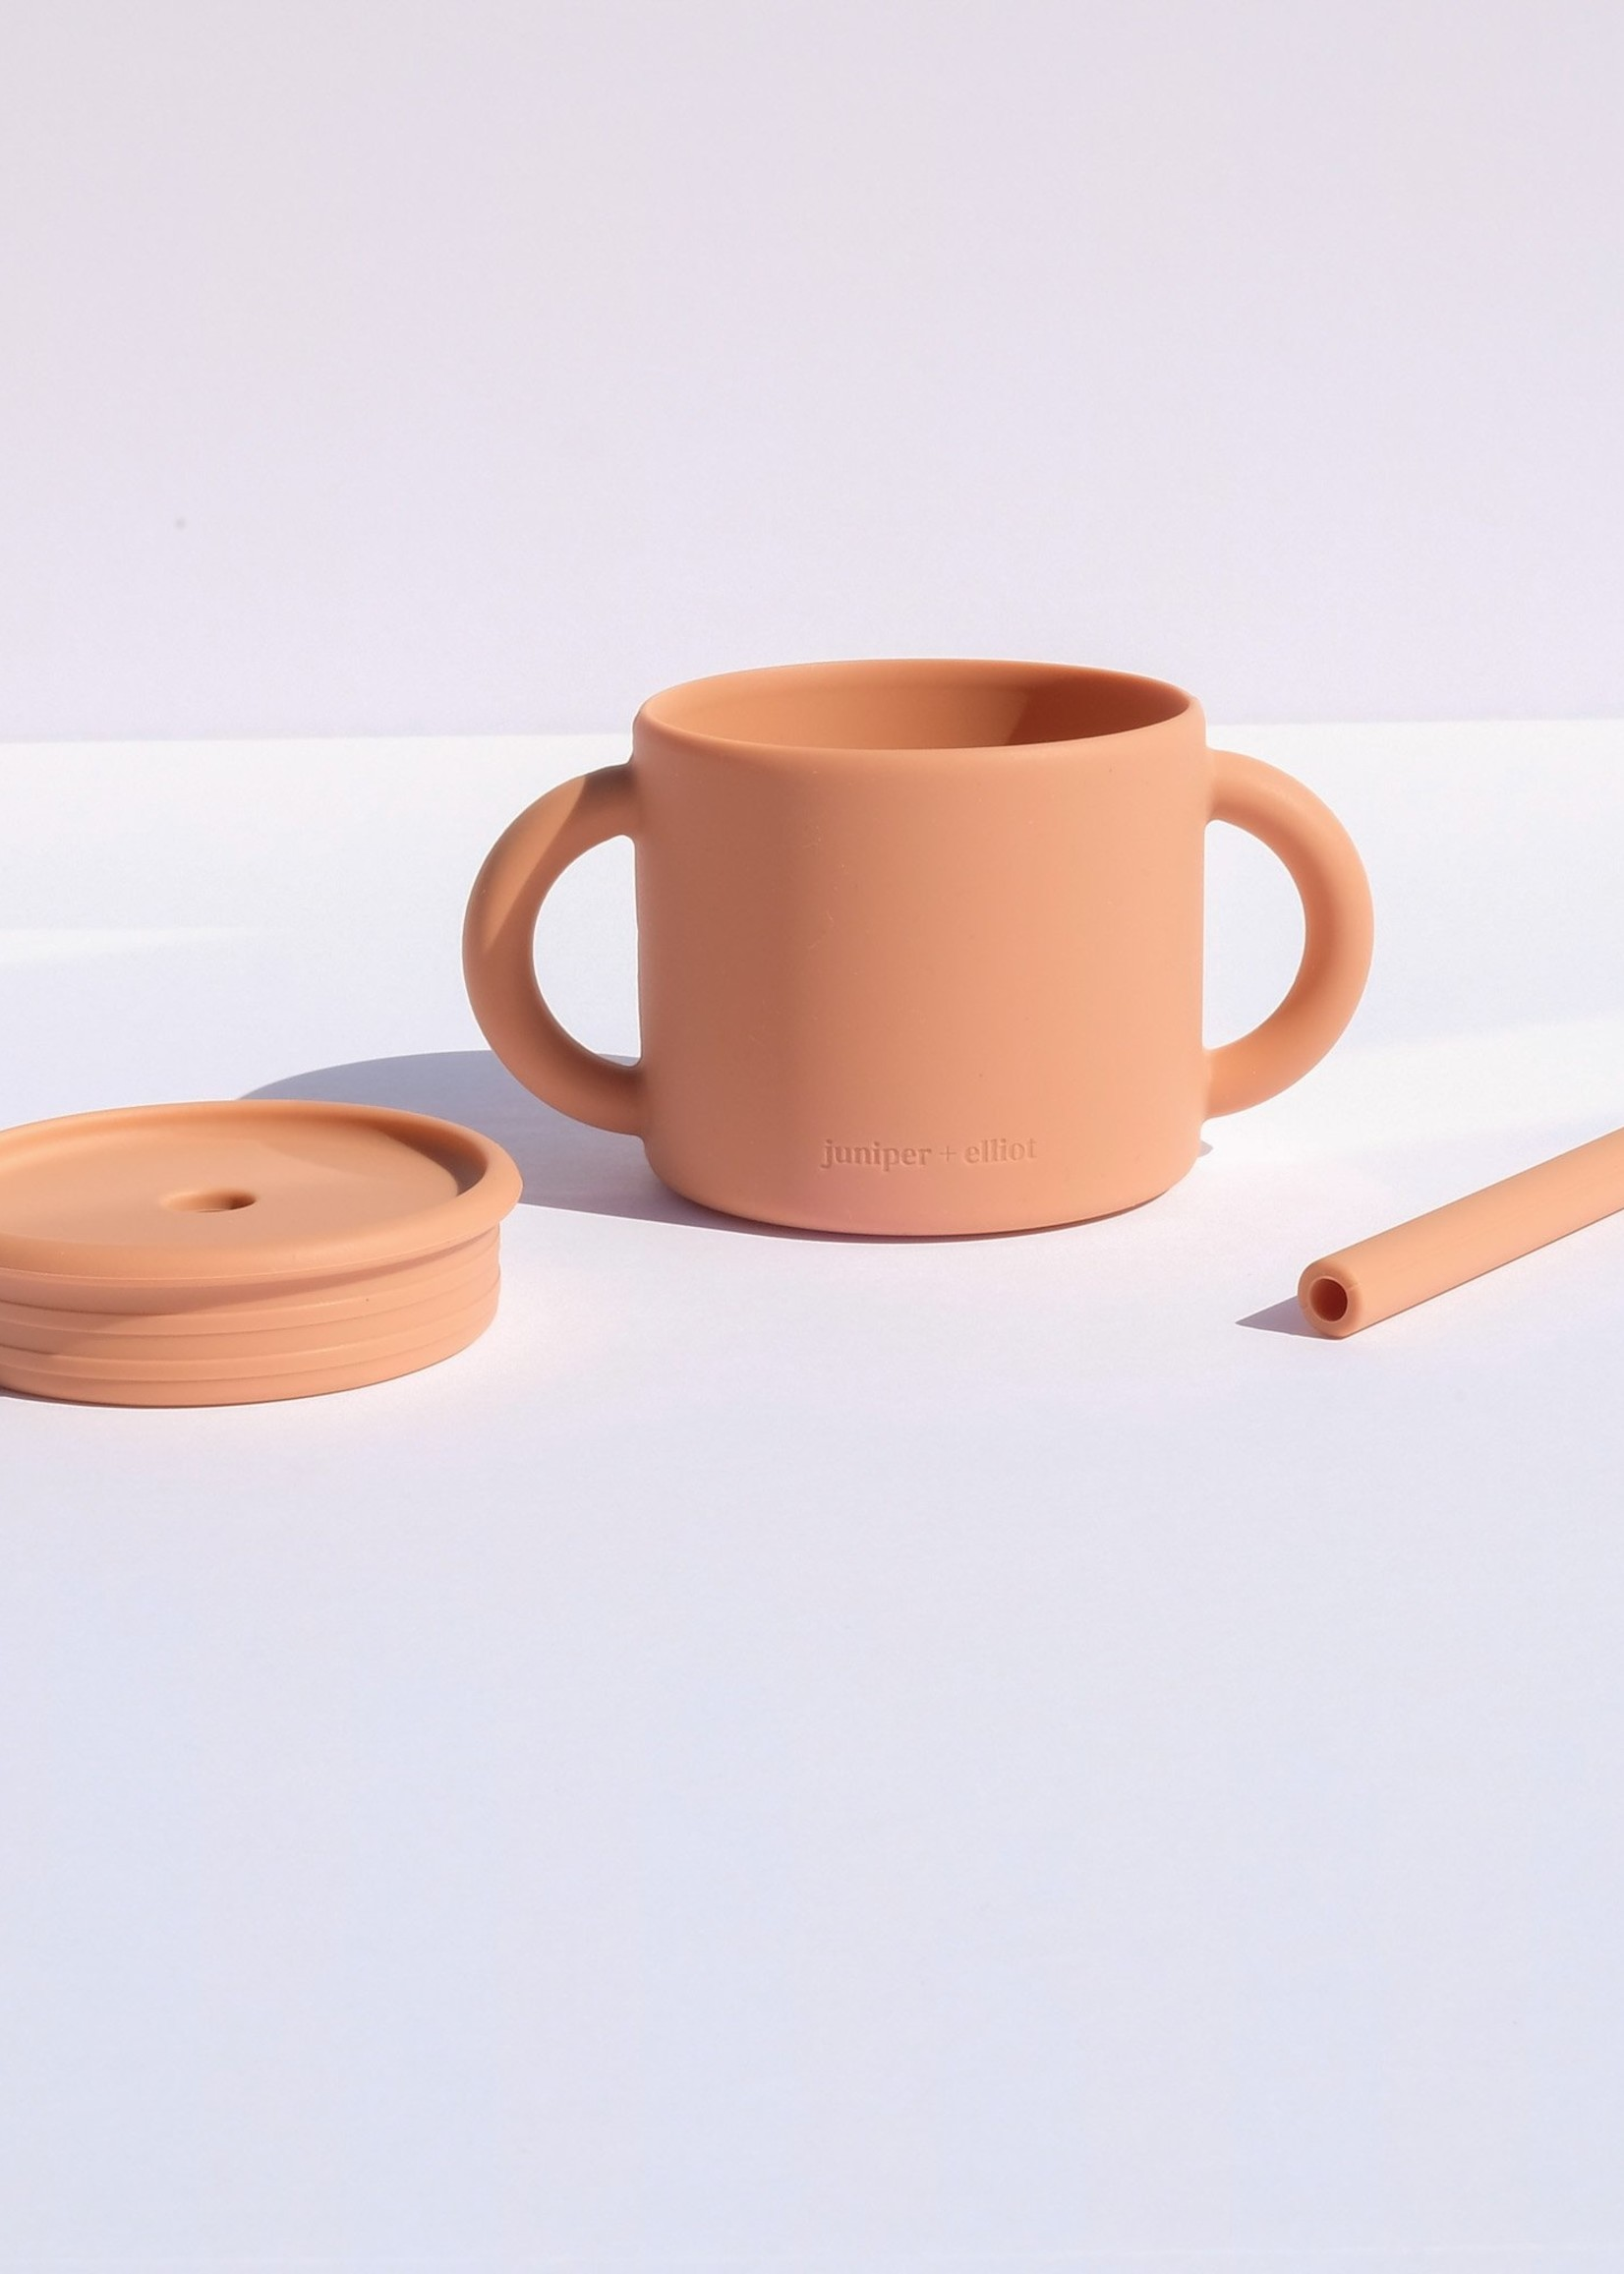 Juniper & Elliot Mig Juni - Straw Cup - Chai